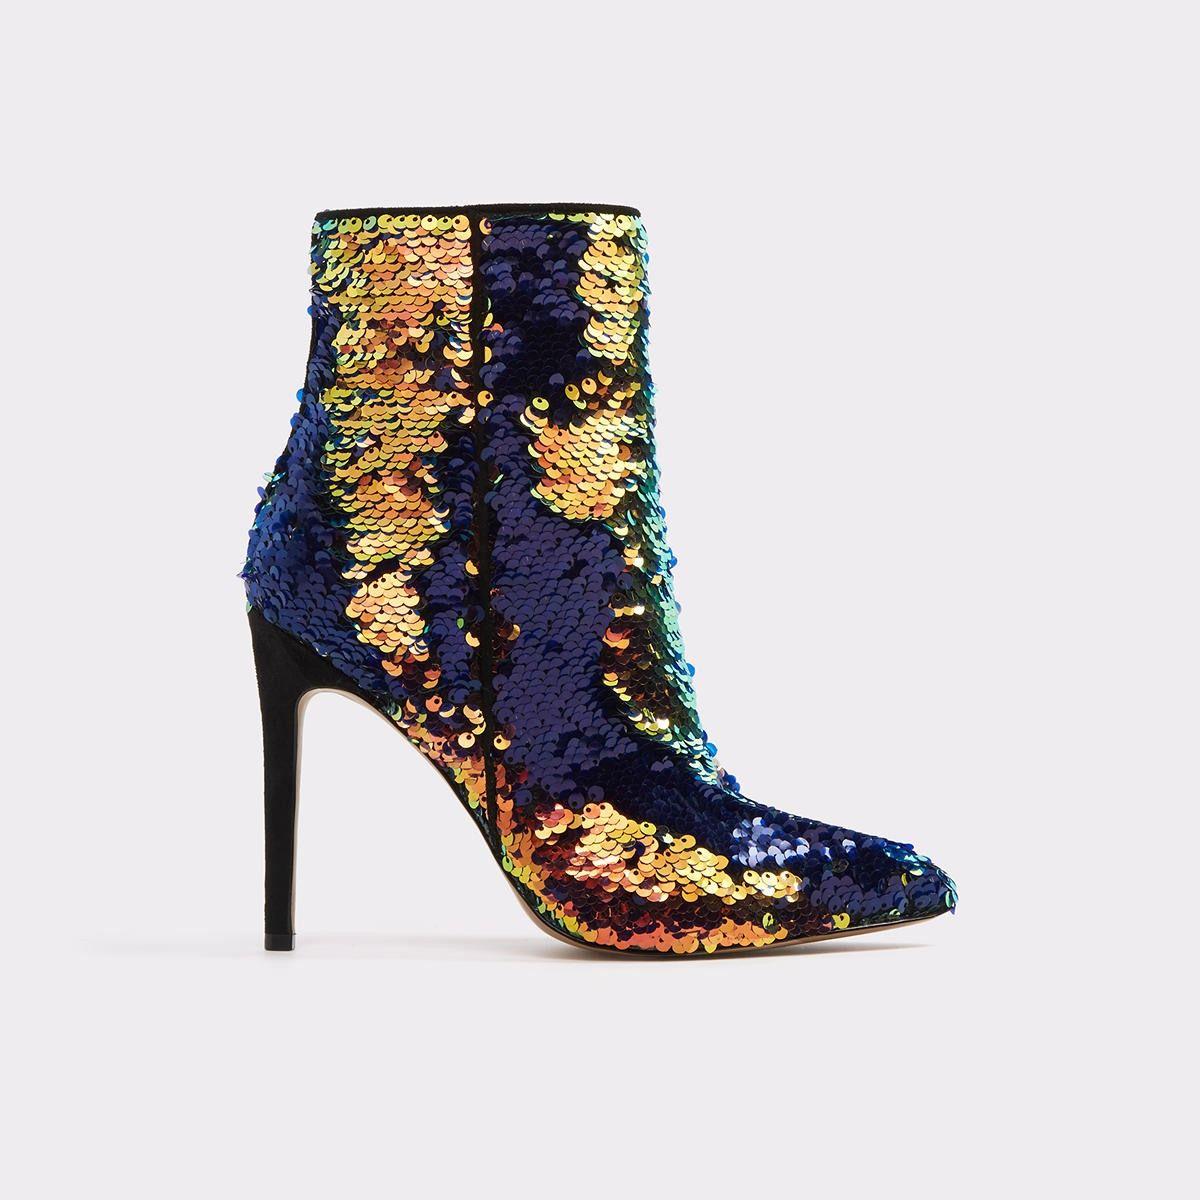 Boots, Stiletto heels